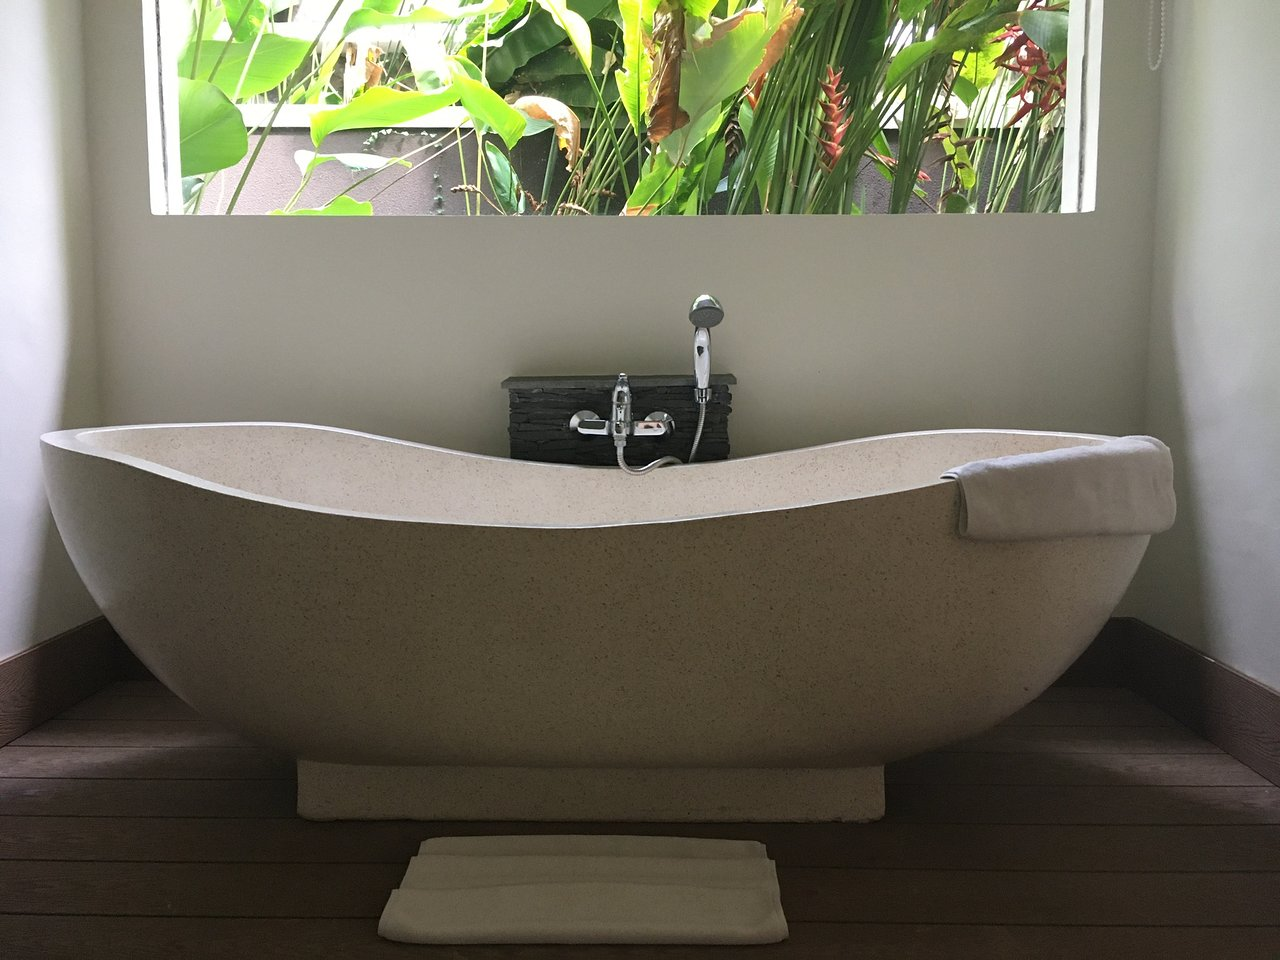 Annupuri Villas Bali Rooms Pictures Reviews Tripadvisor